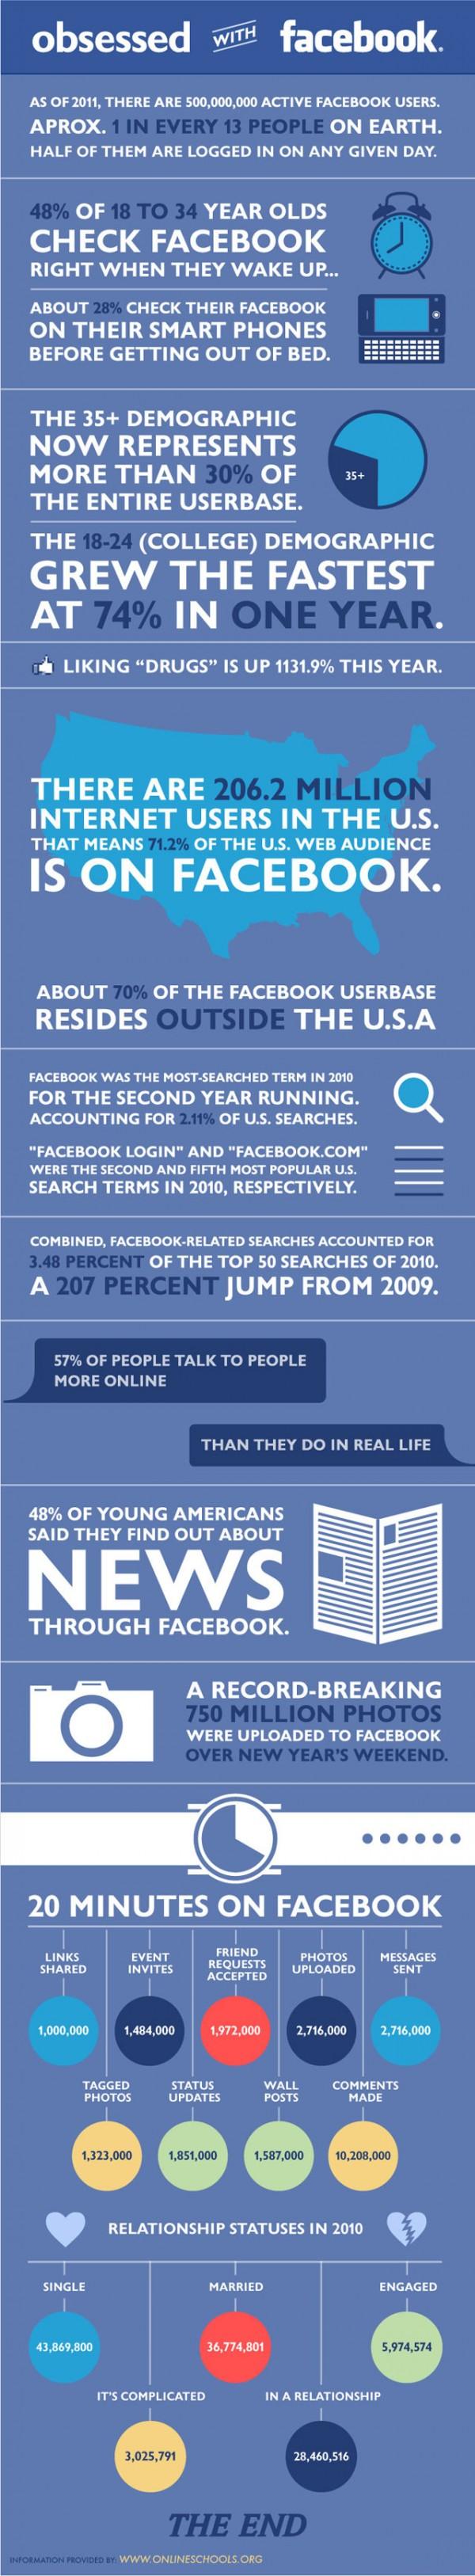 infographic-on-social-media-13